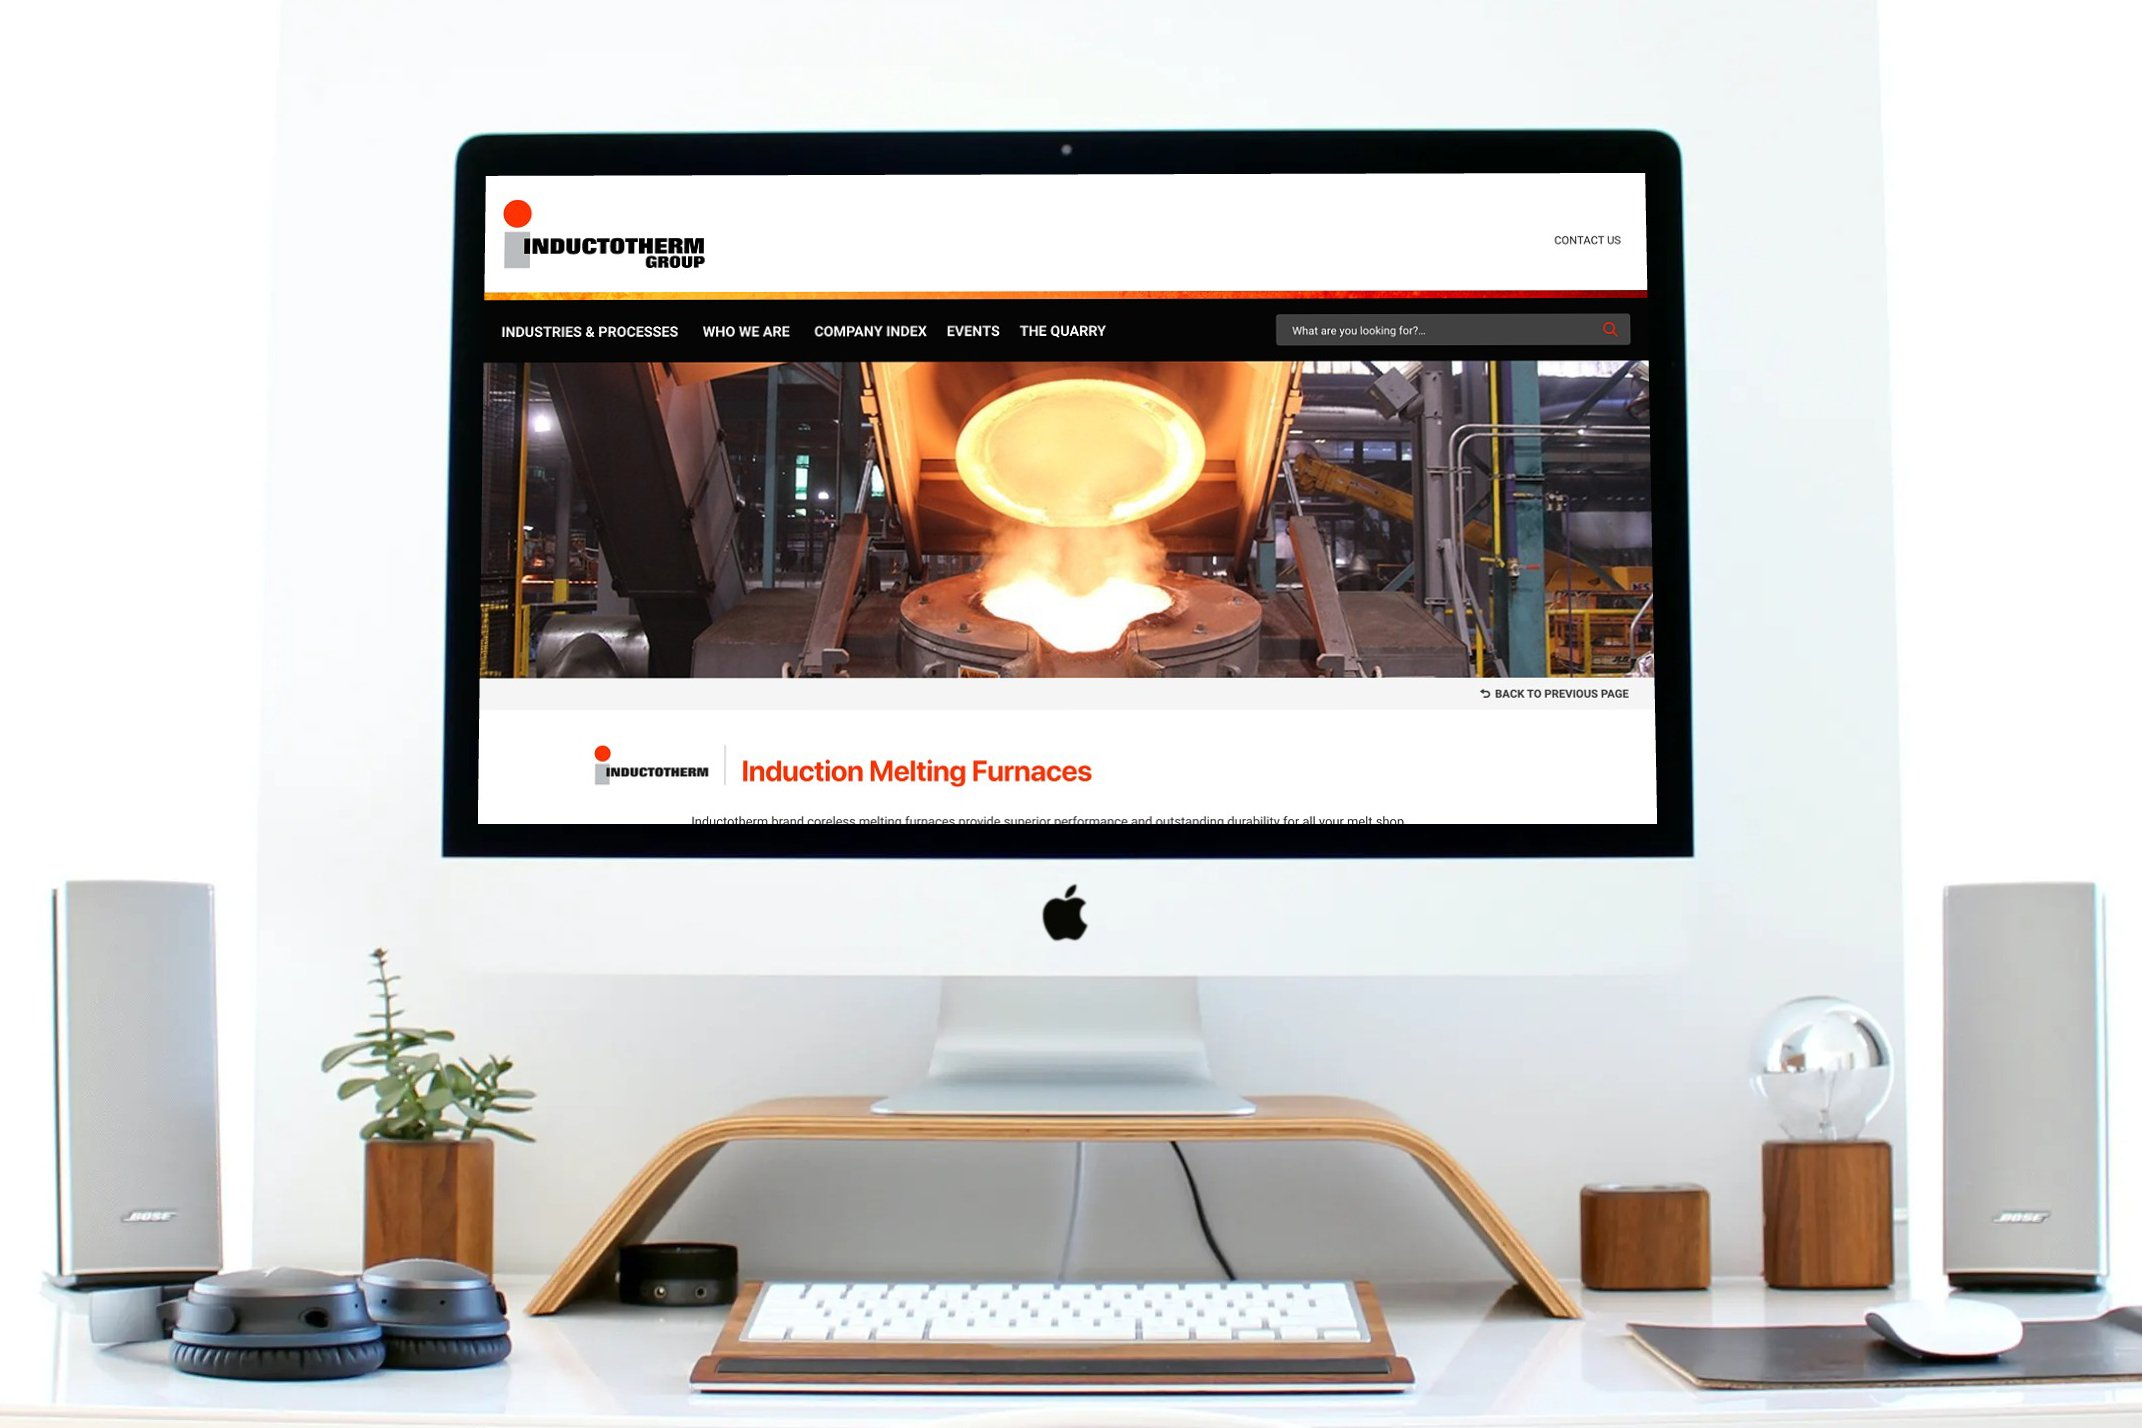 multinational, multilingual website designed by Blue Blaze on a desktop